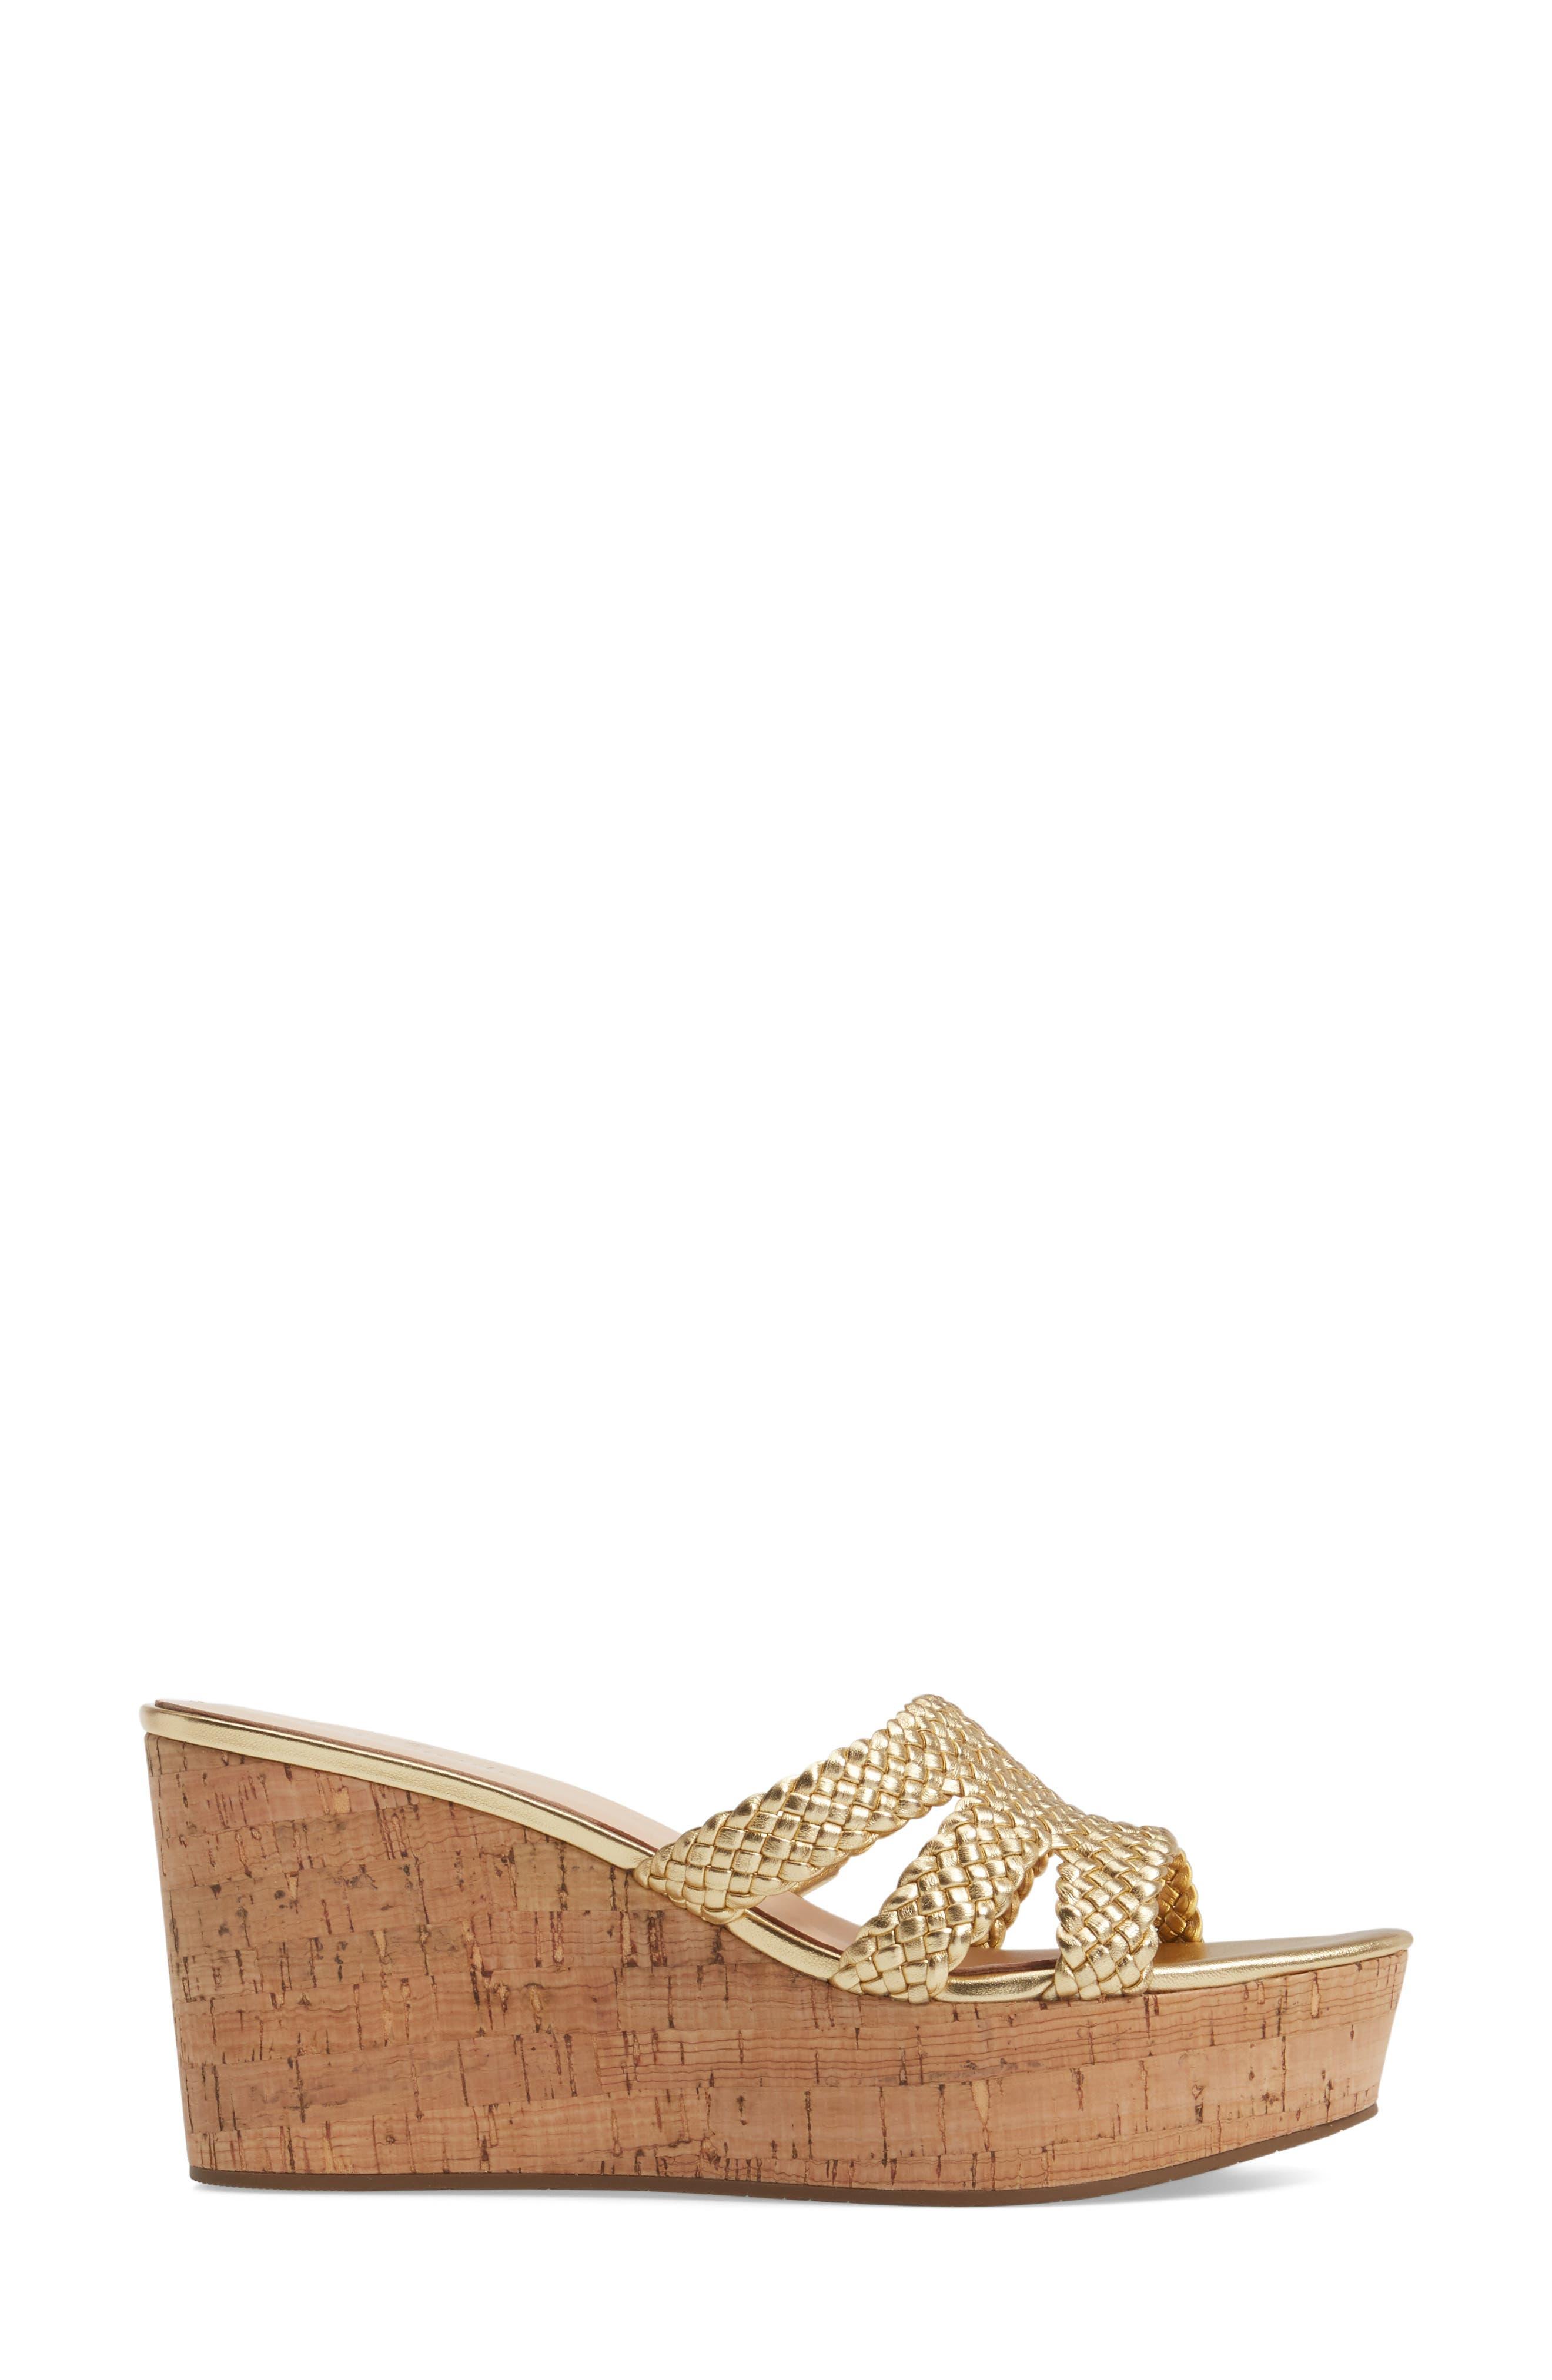 tarvela wedge sandal,                             Alternate thumbnail 3, color,                             Old Gold Woven Metallic Nappa